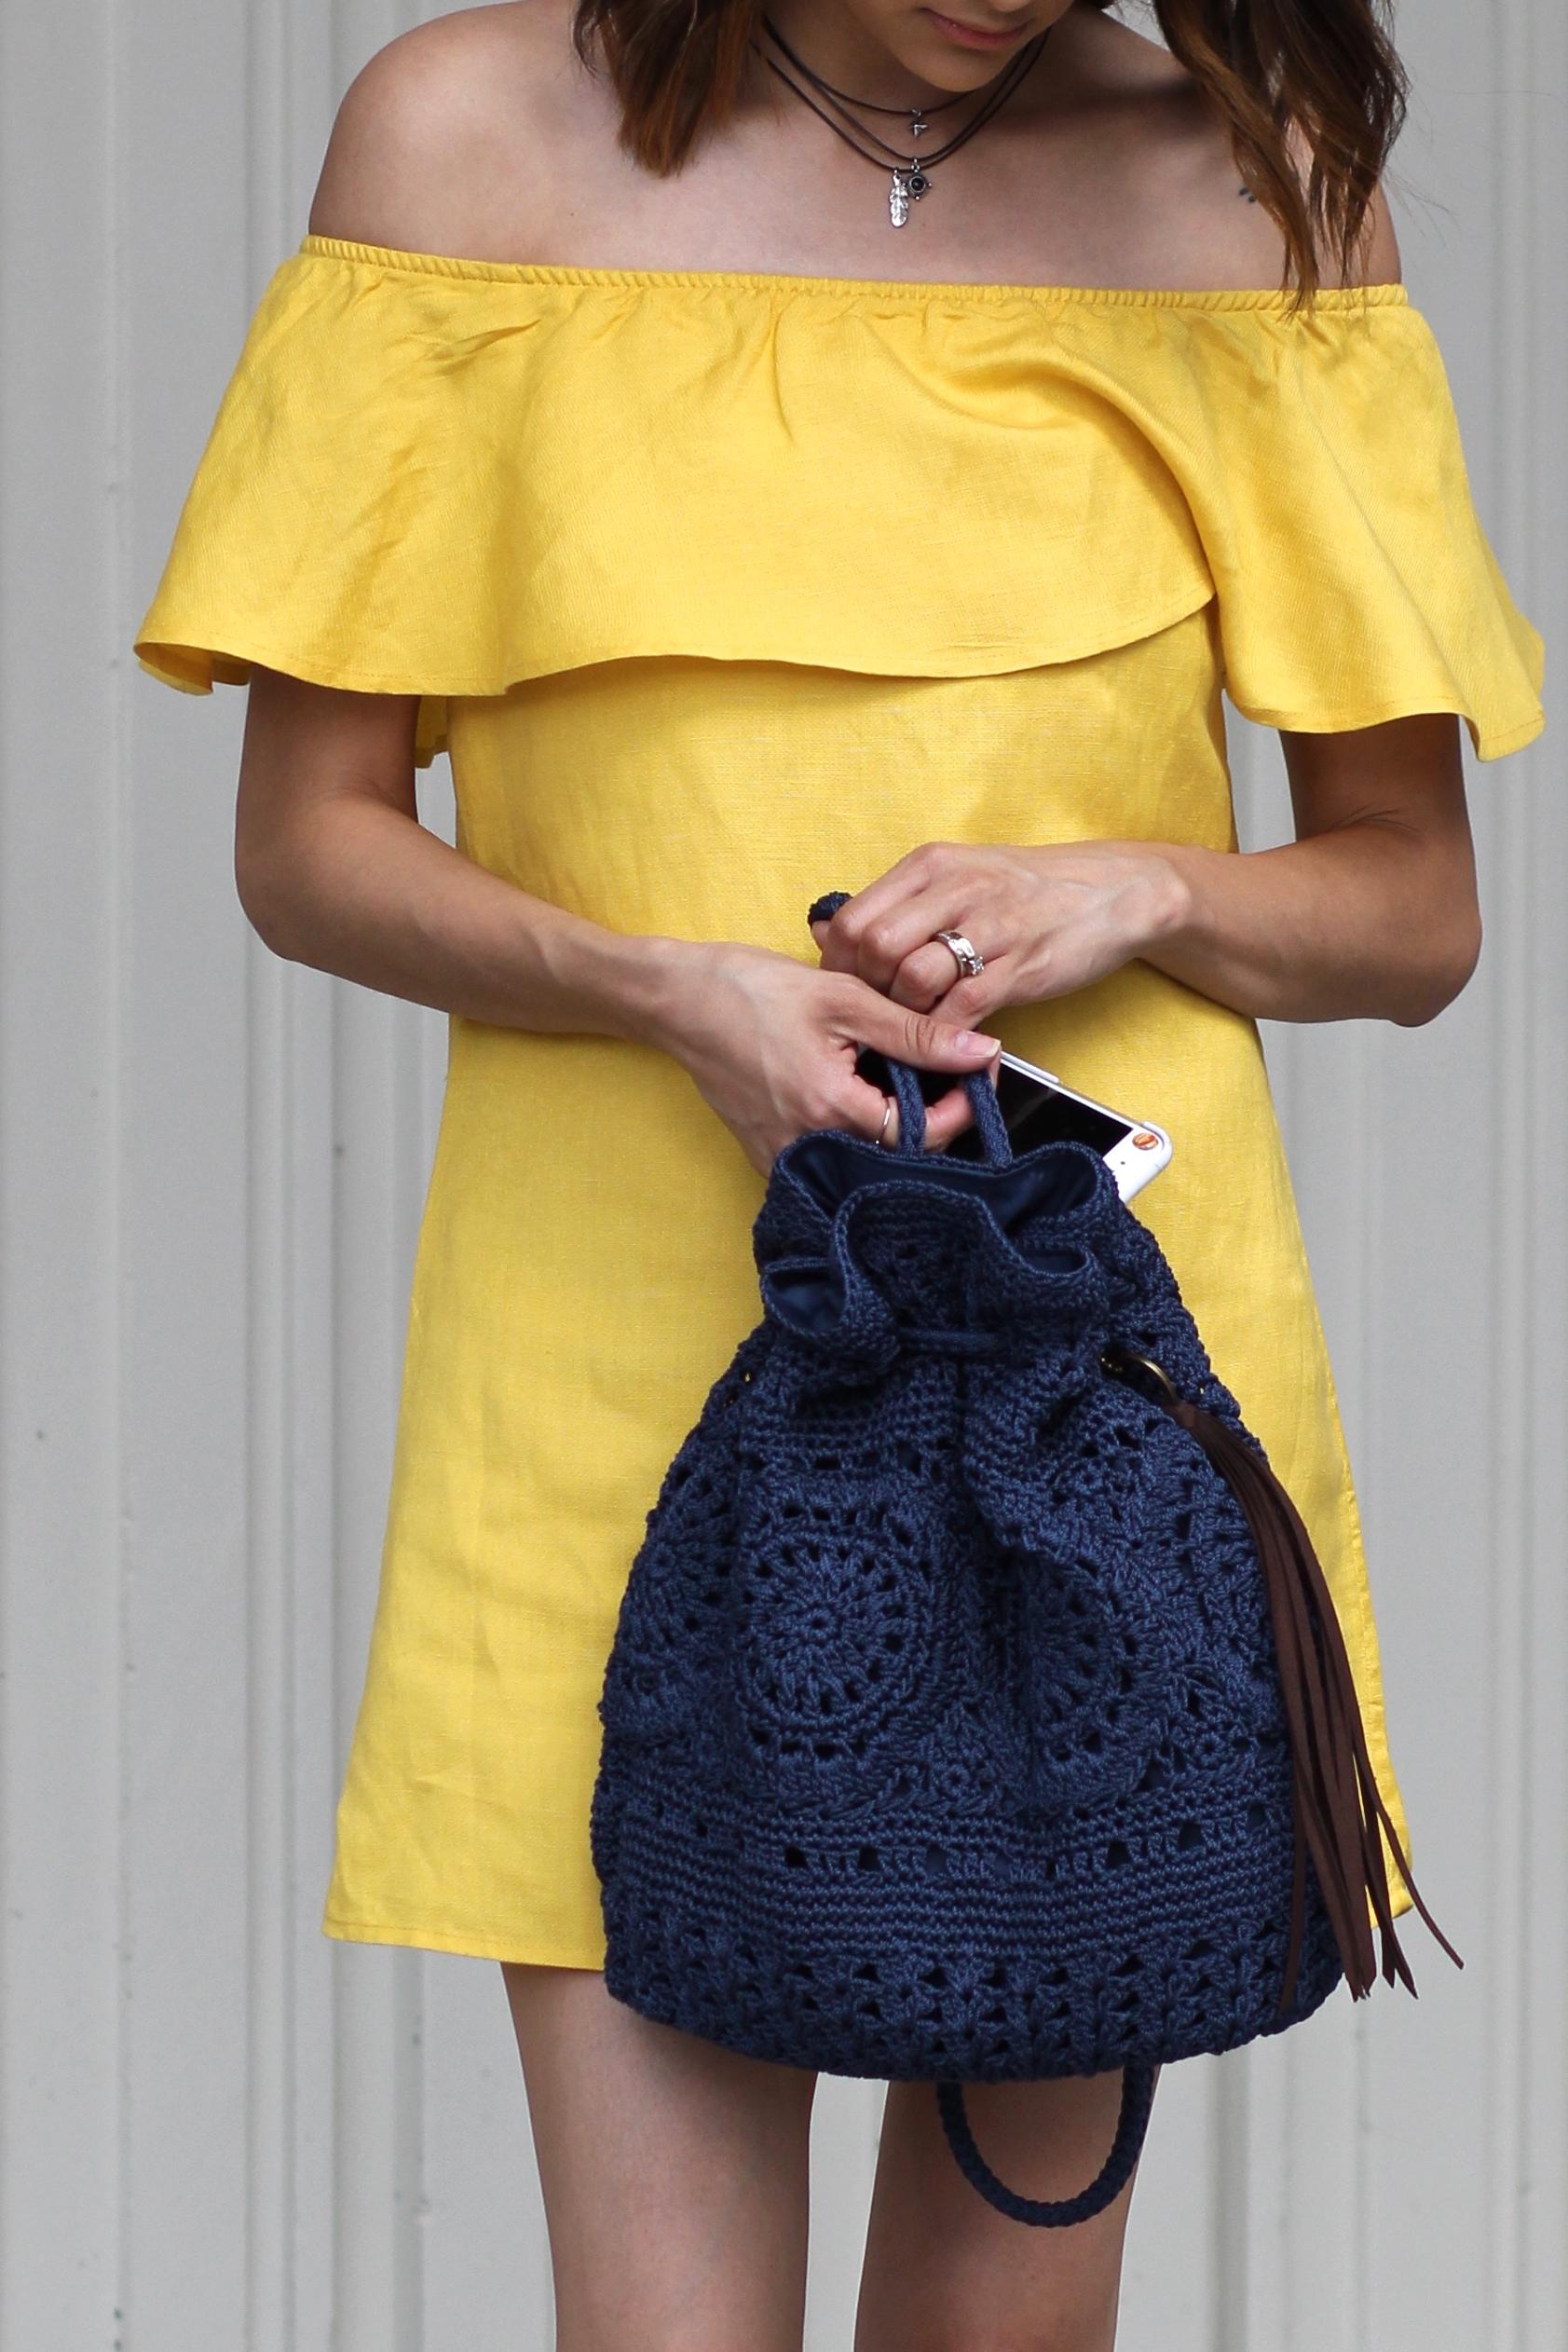 Sayulita crocheted backpack